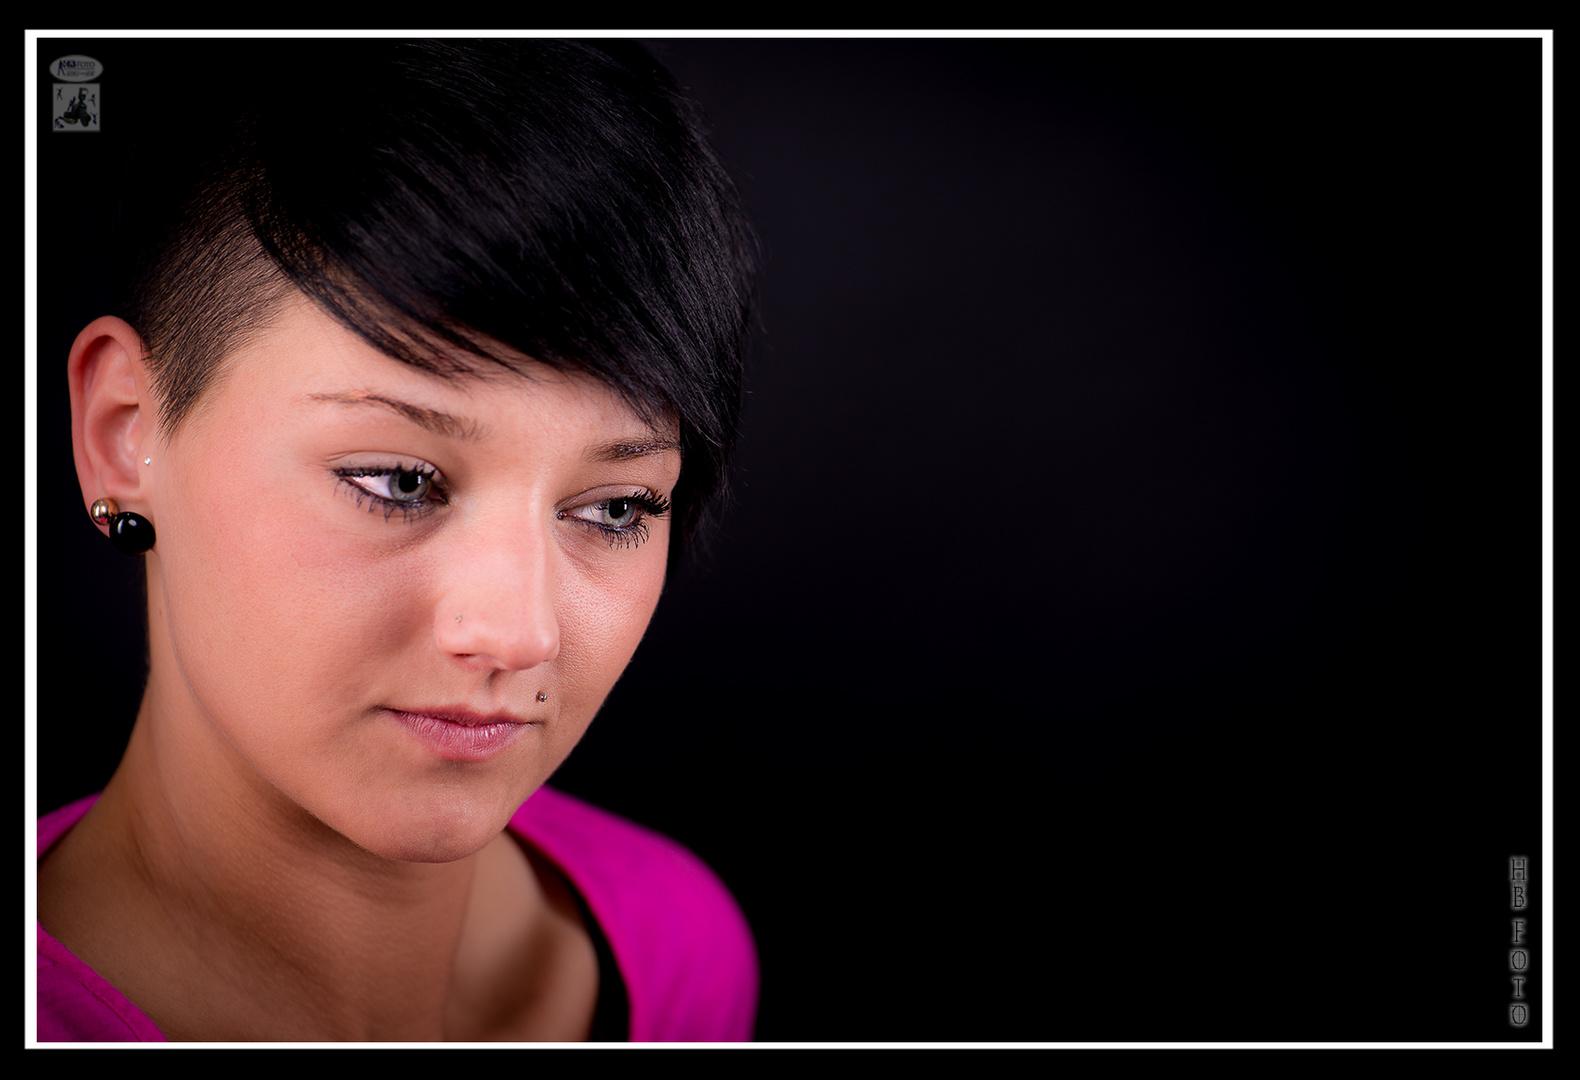 Short Black Hair - cool eyes